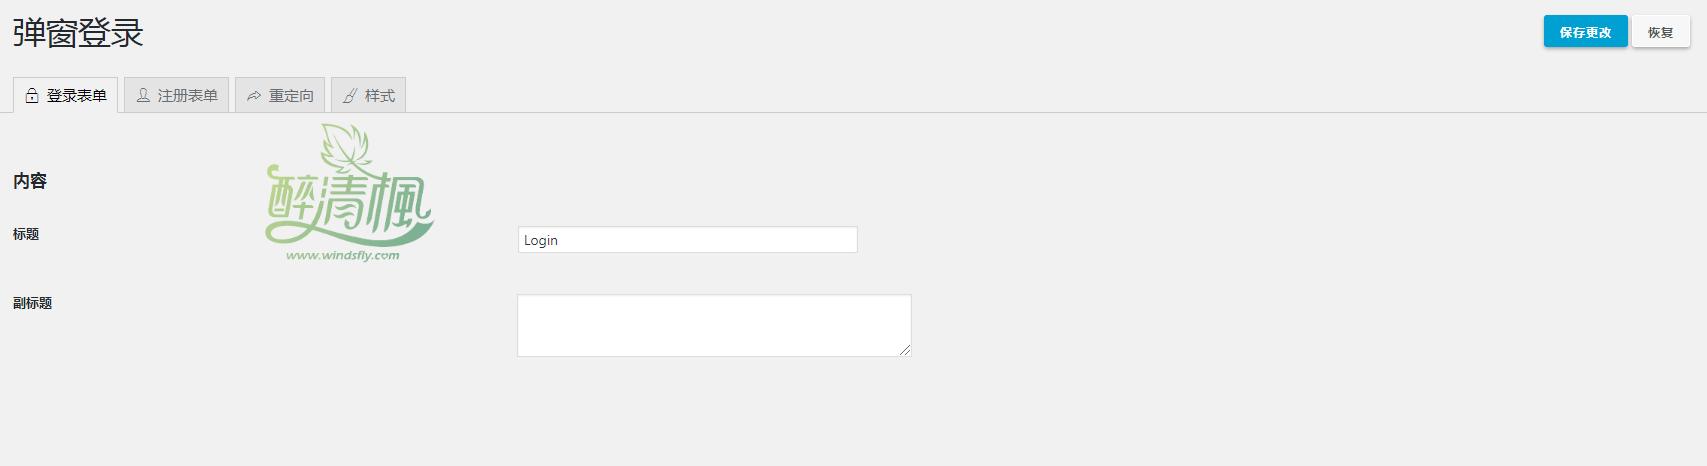 WordPress弹窗登录注册插件 - PressApps Modal Login v2.0.5(汉化) WordPress插件 第2张